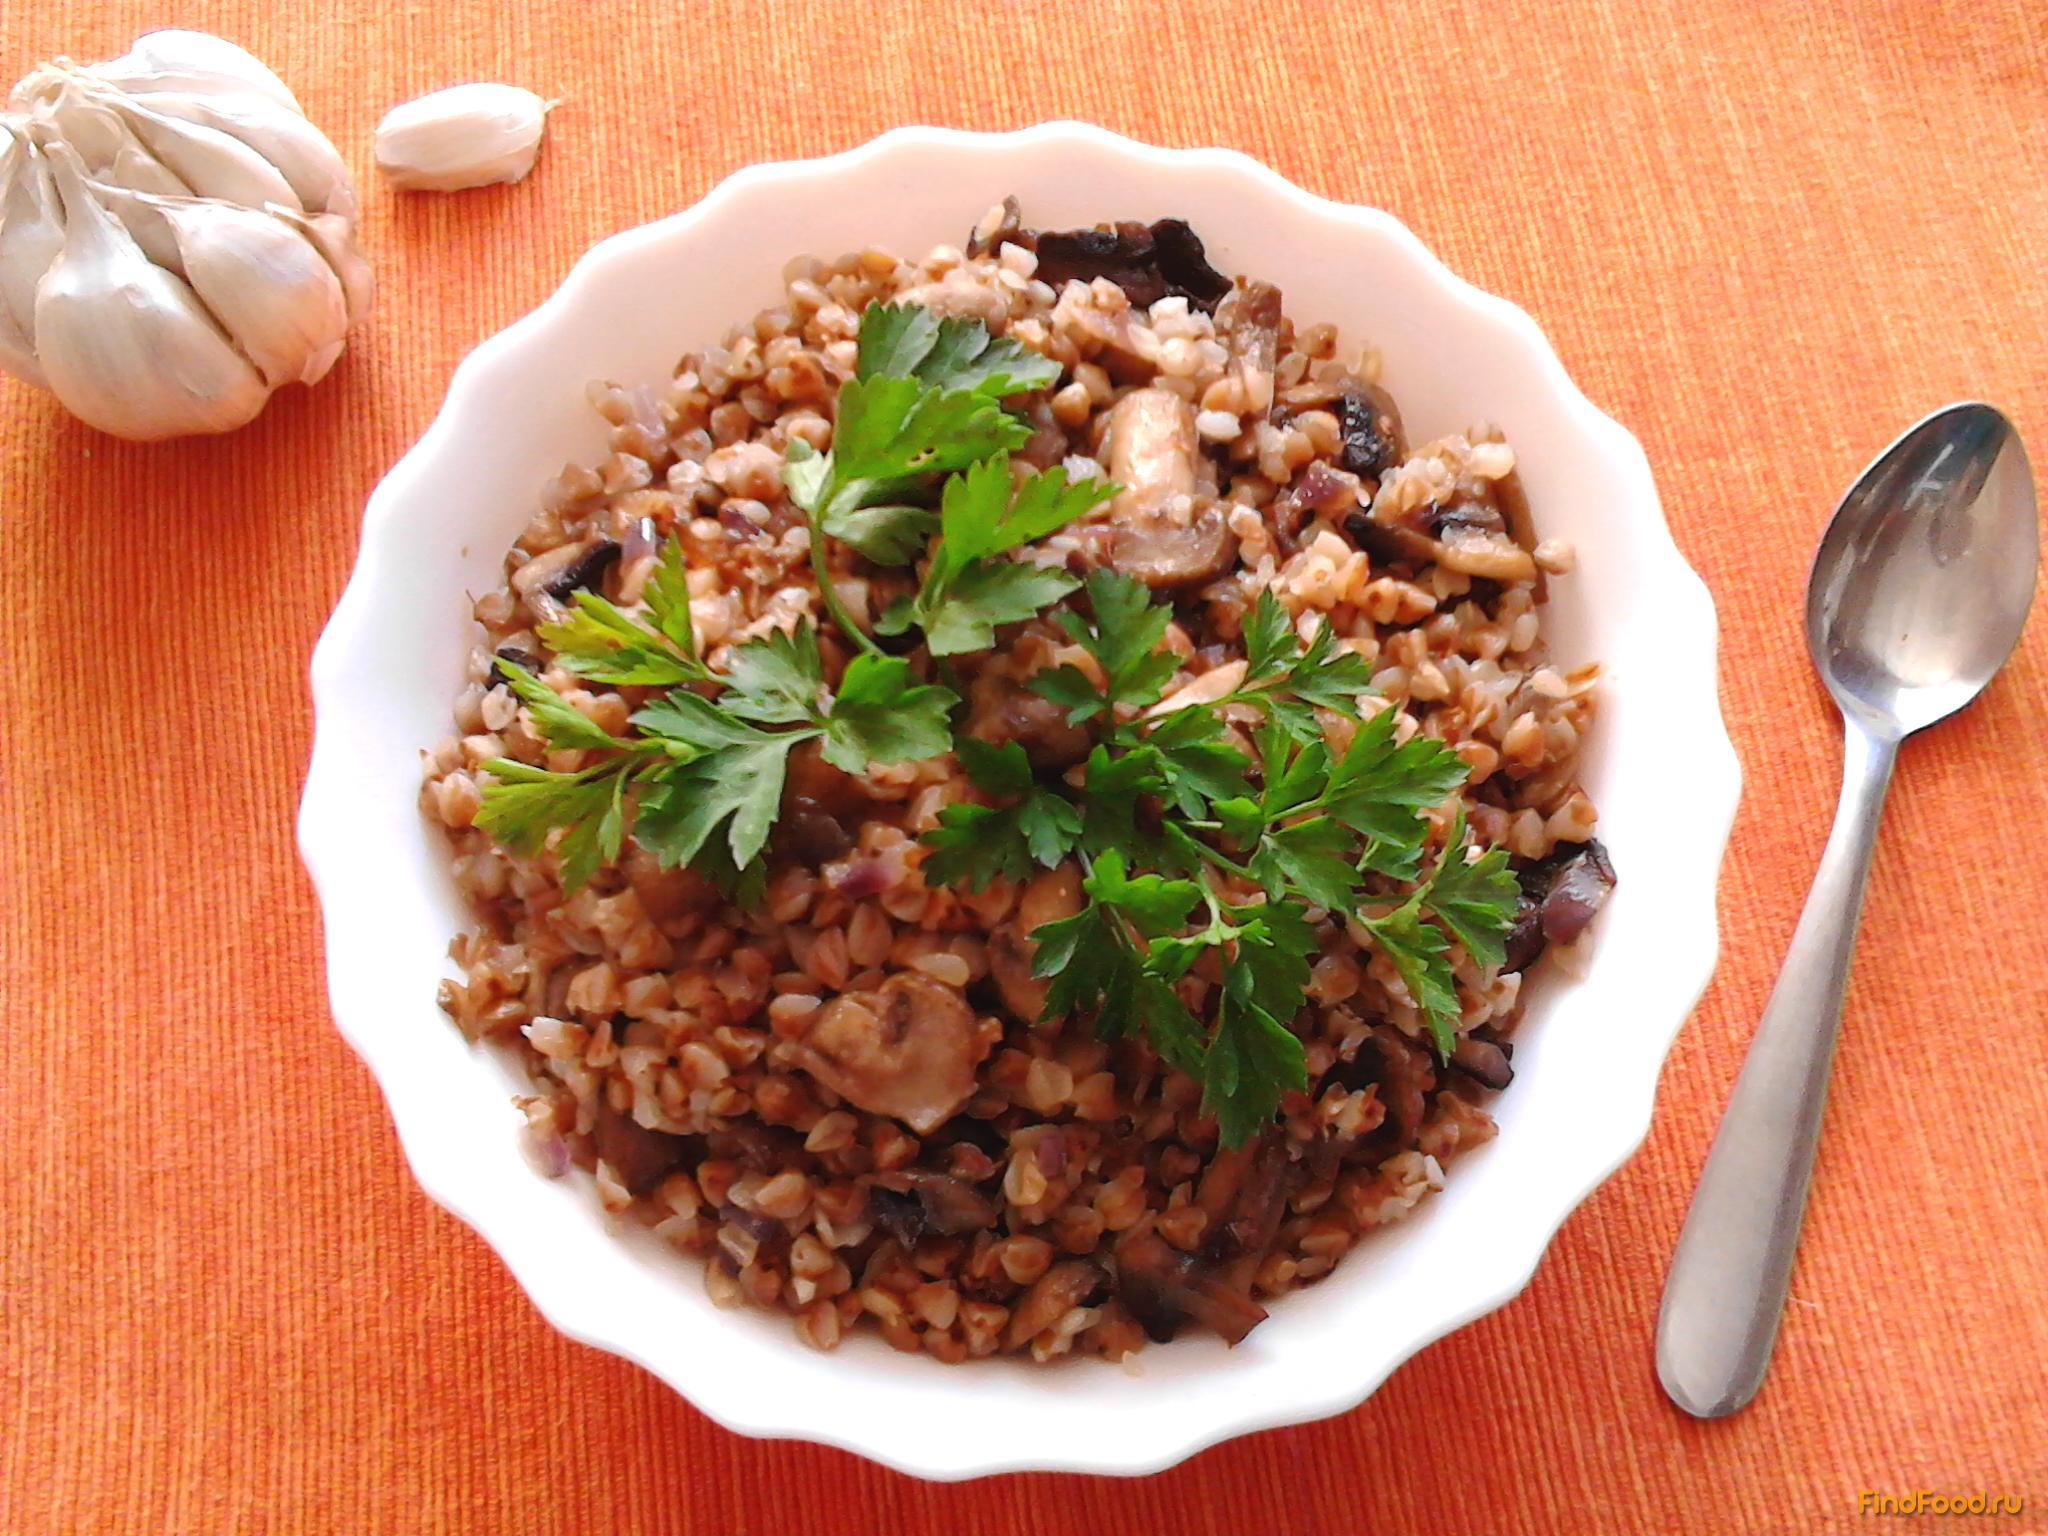 Мясо по царски с гречкой рецепт пошагово